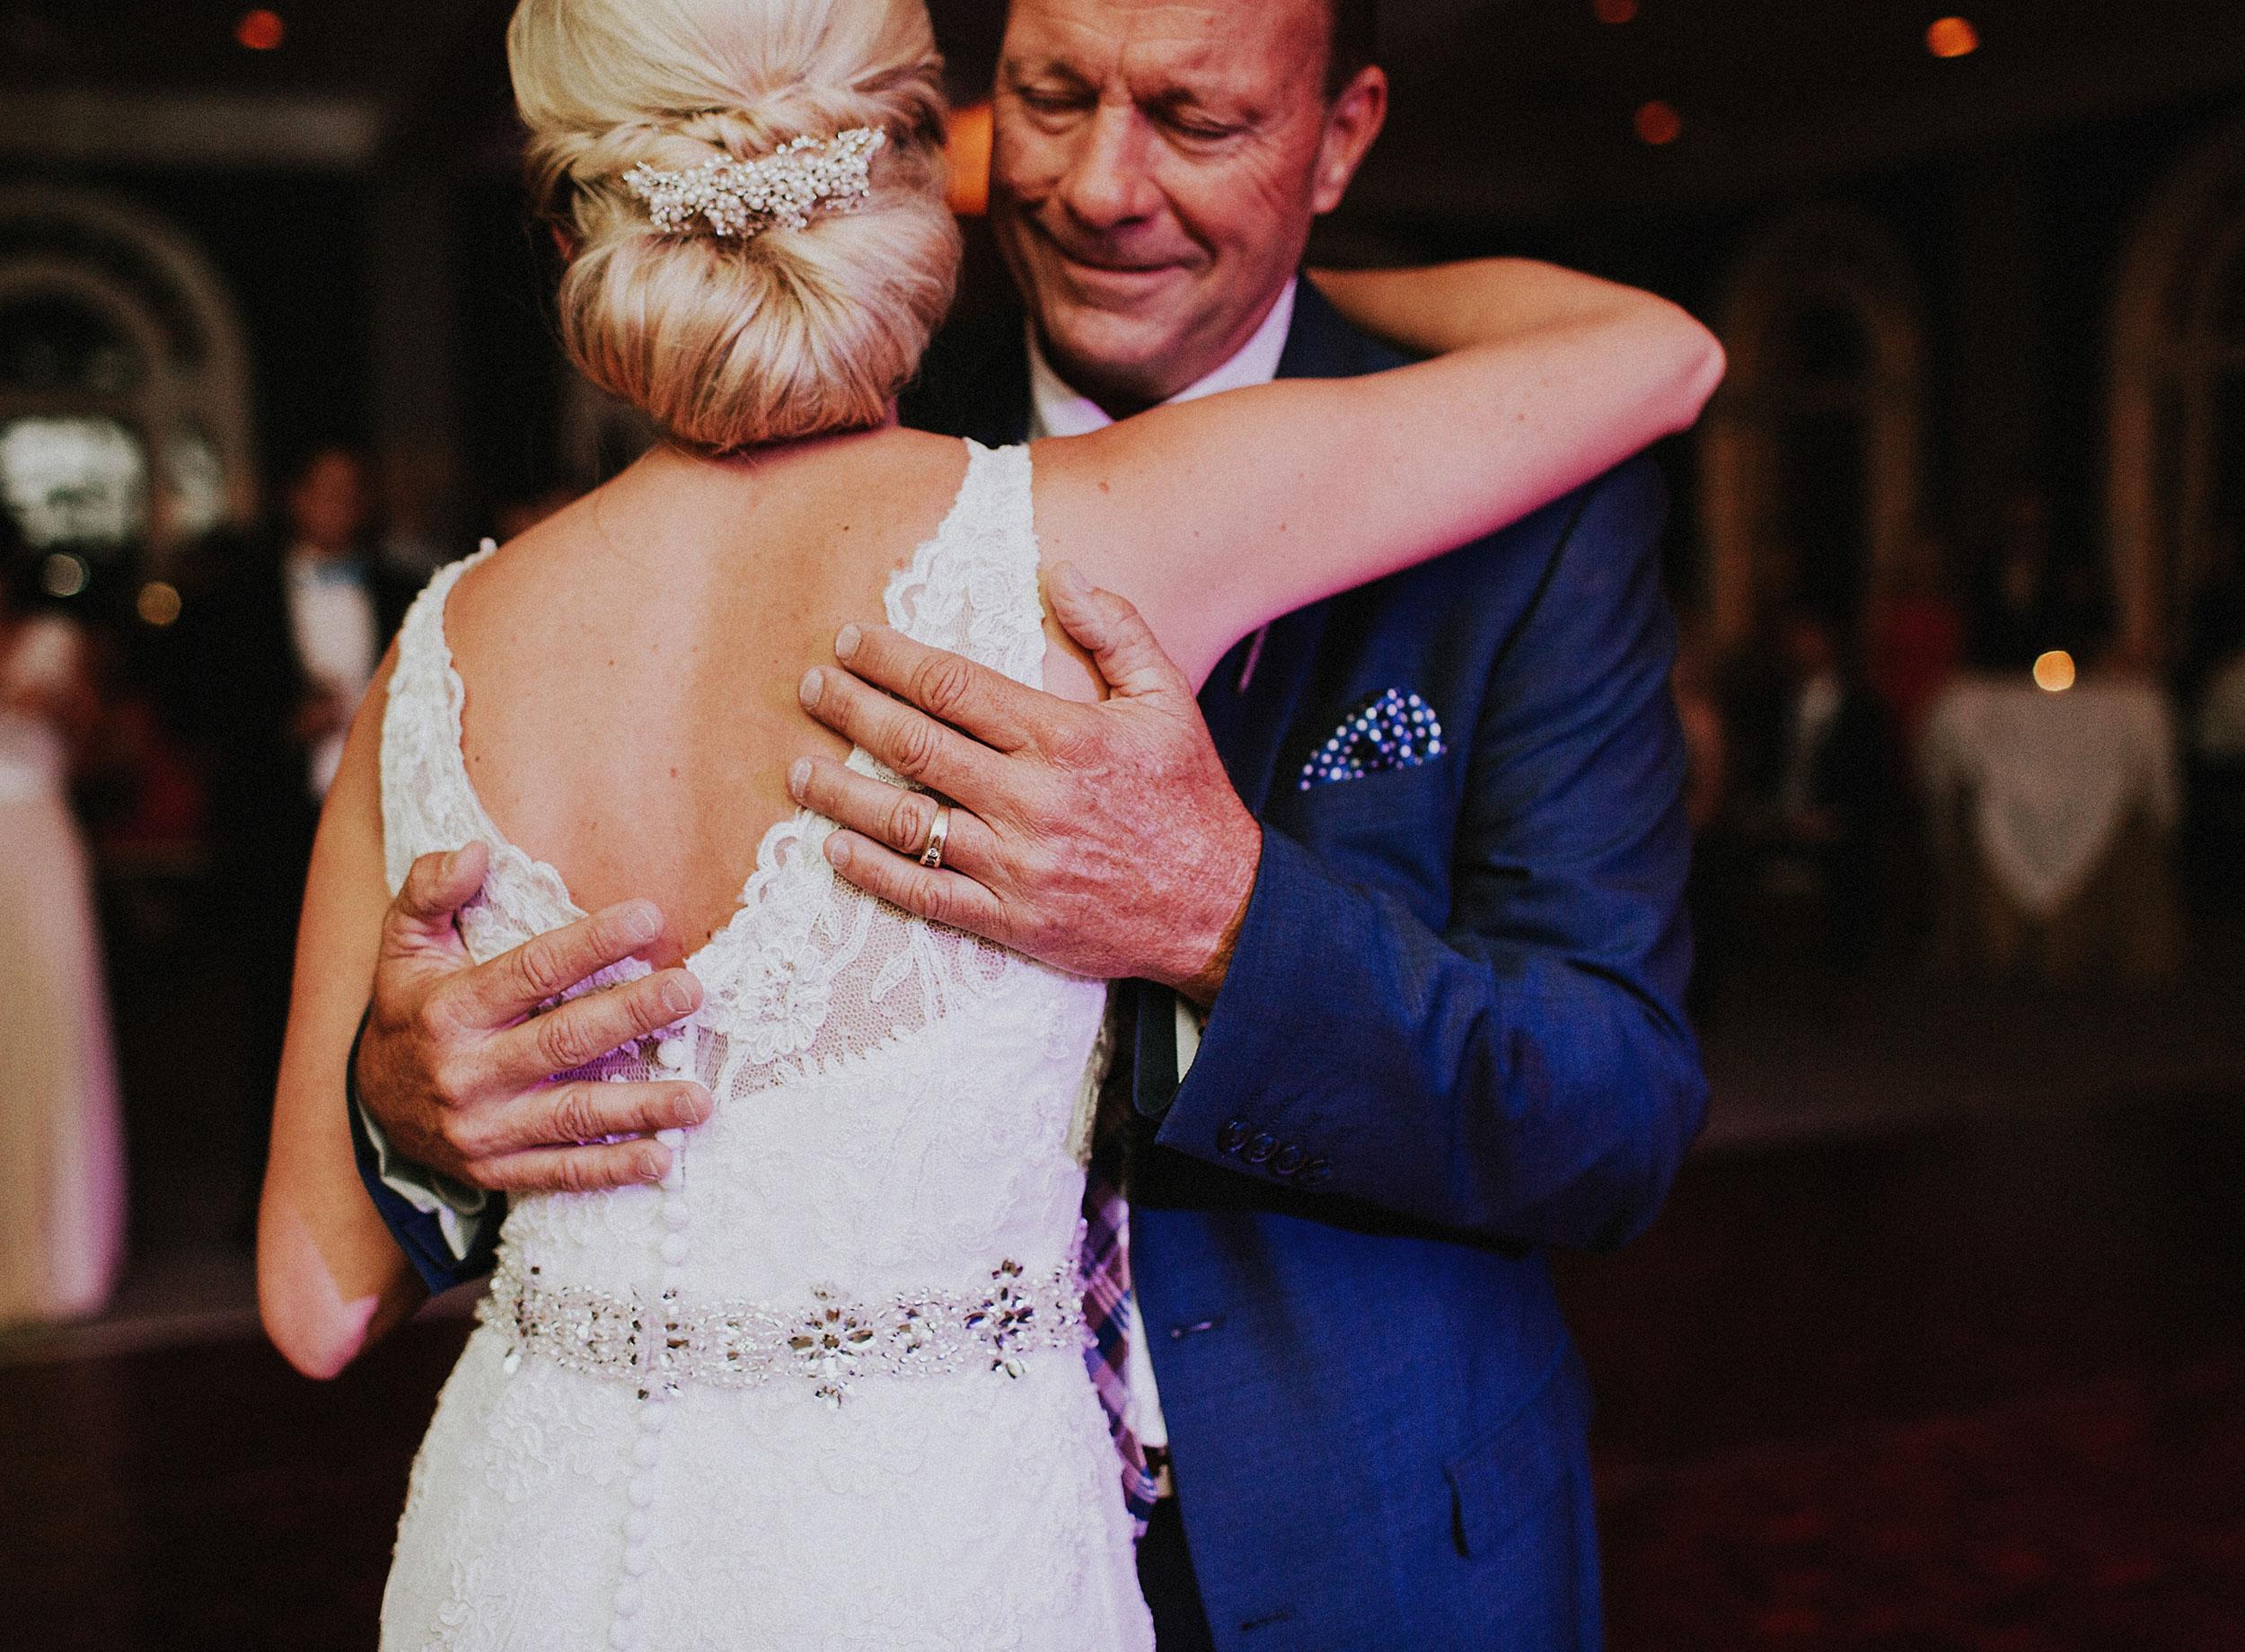 olmsted-wedding-louisville-kentucky-041.JPG